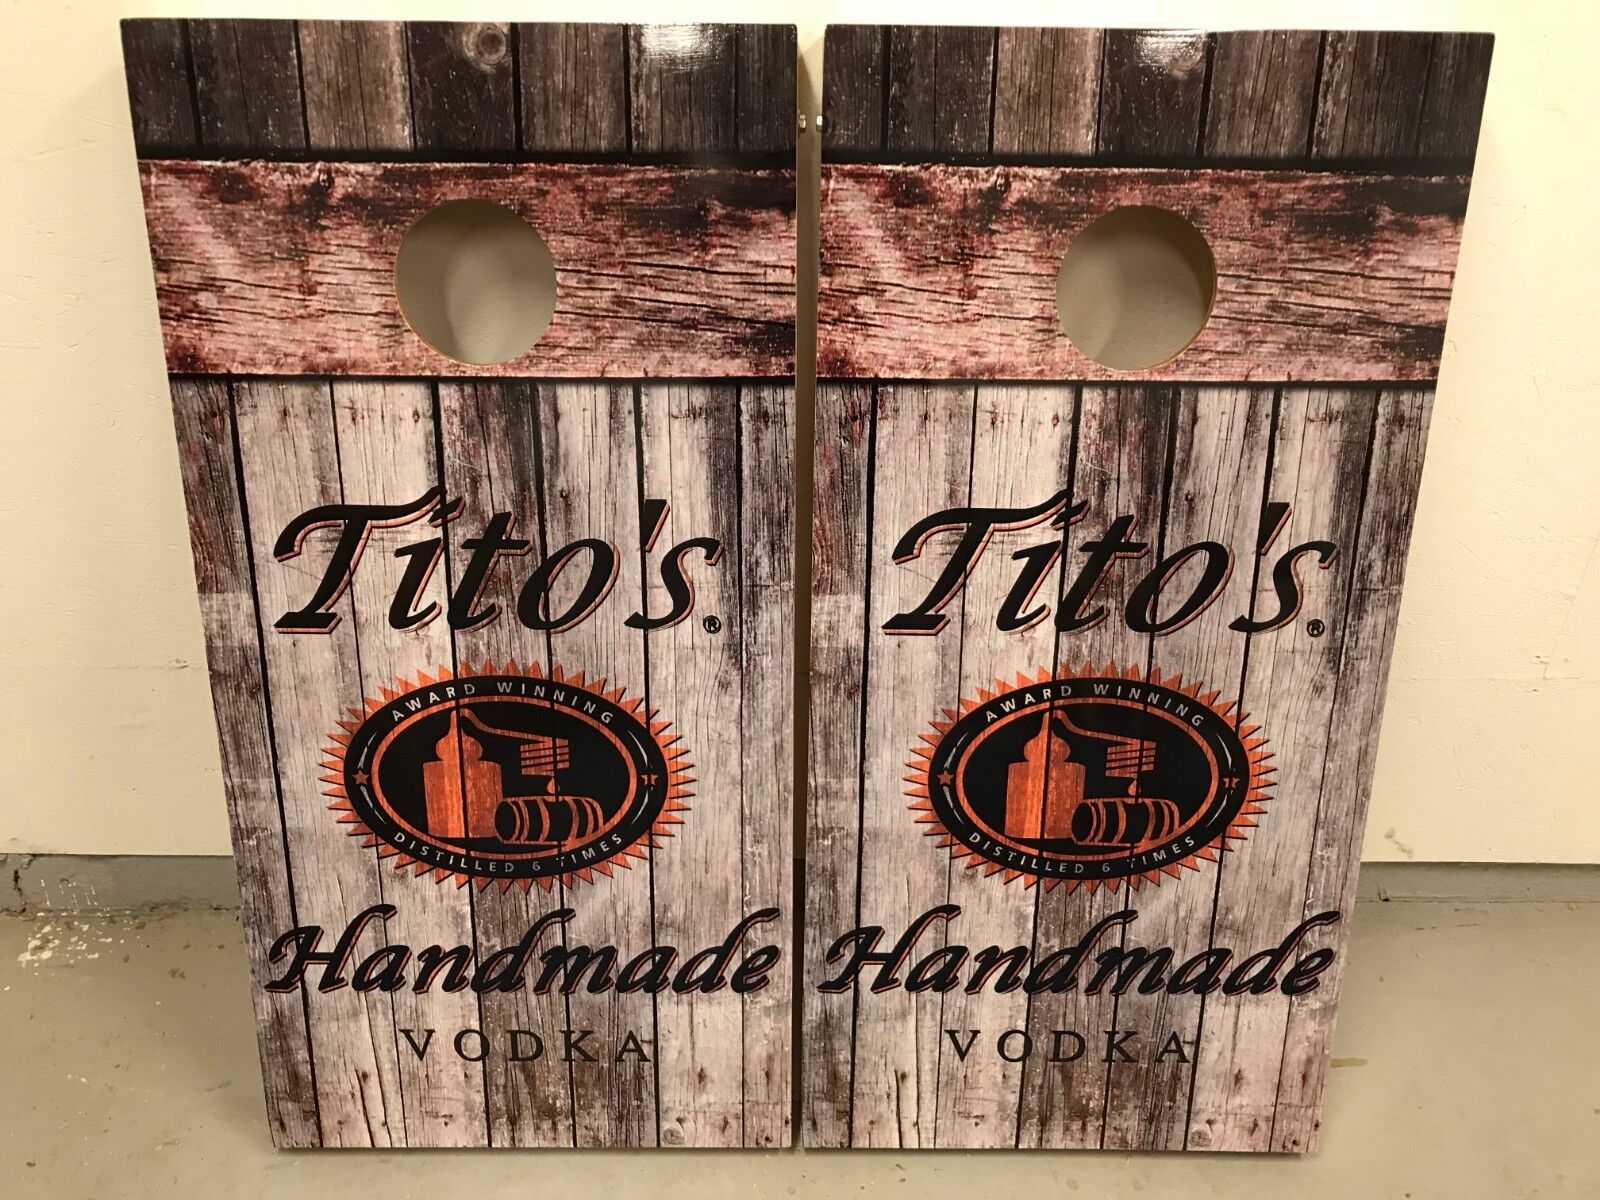 Tito's Vodka On Barn Wood Corn Hole Boards - Bean Bag Toss Game